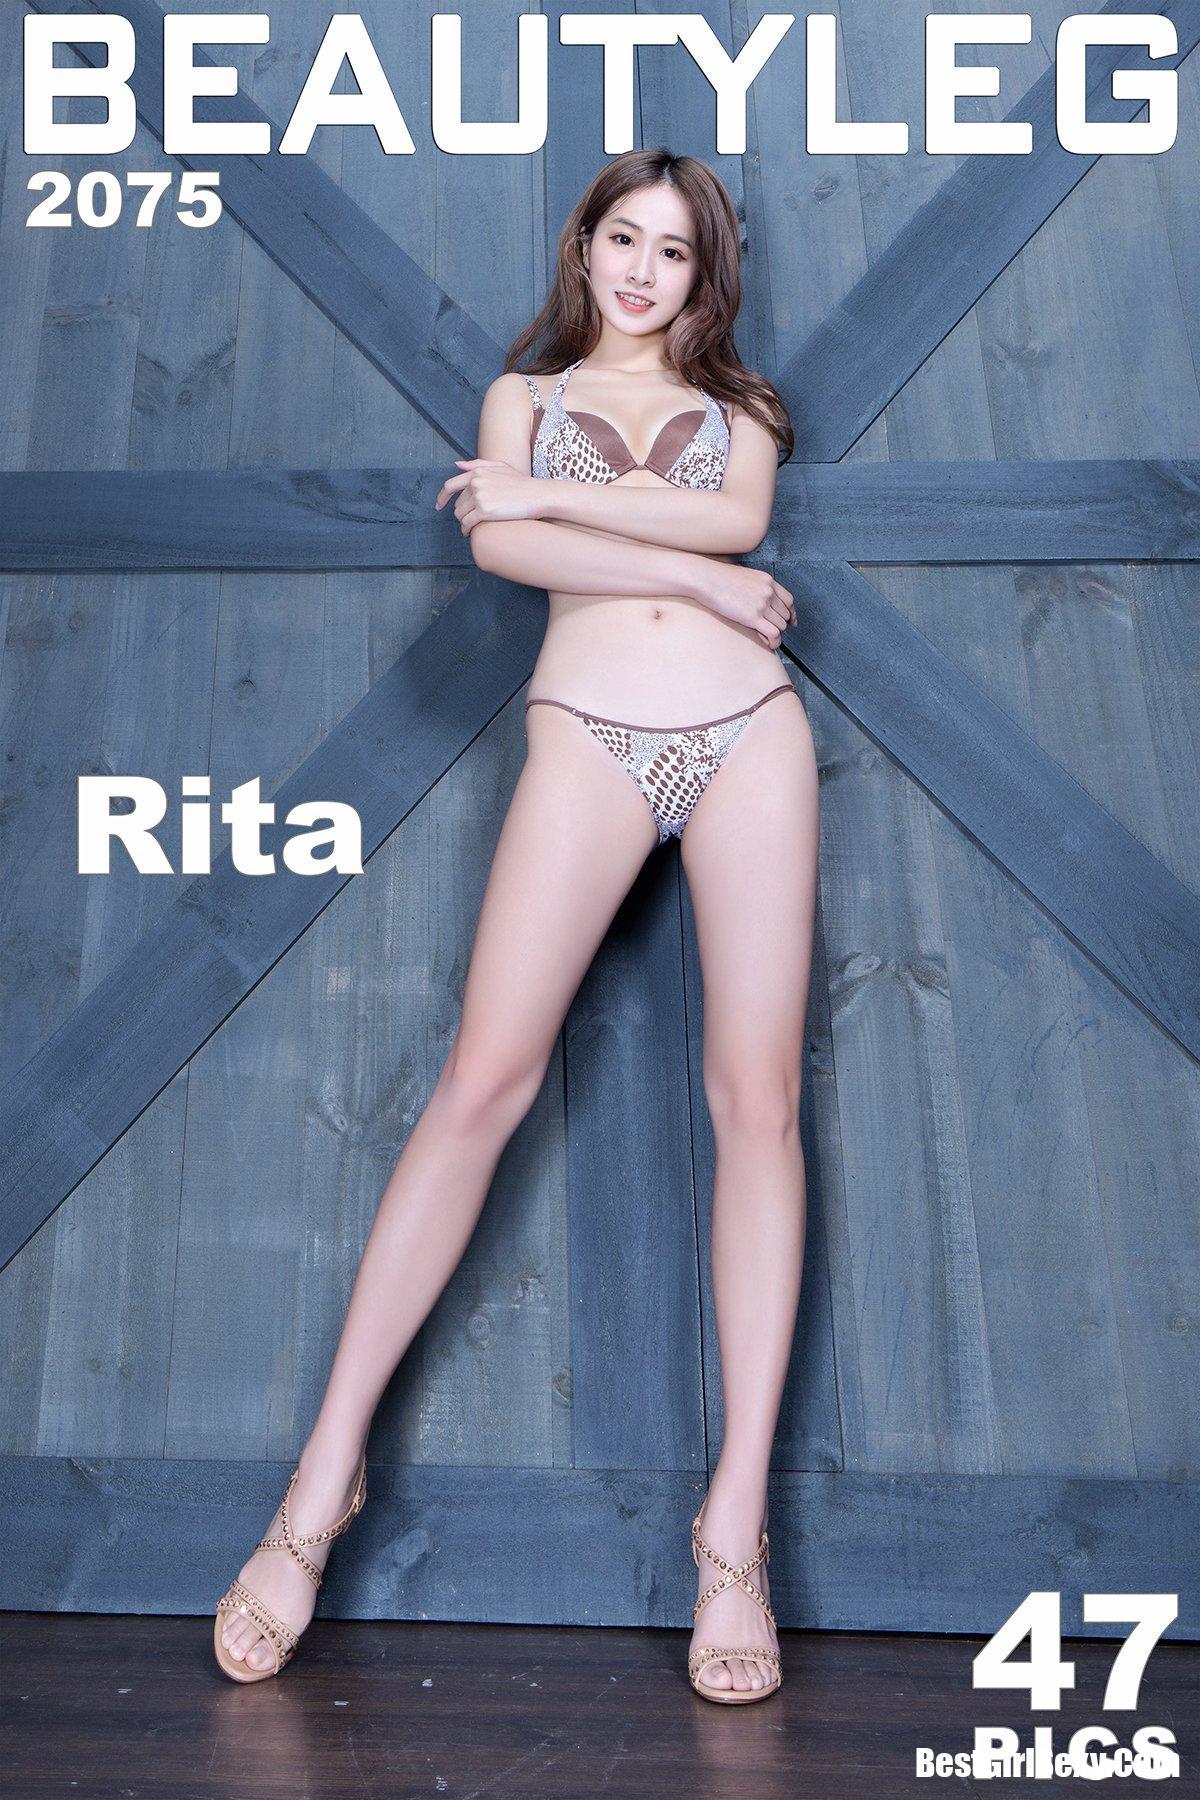 Beautyleg美腿寫真 No.2075 Rita 81